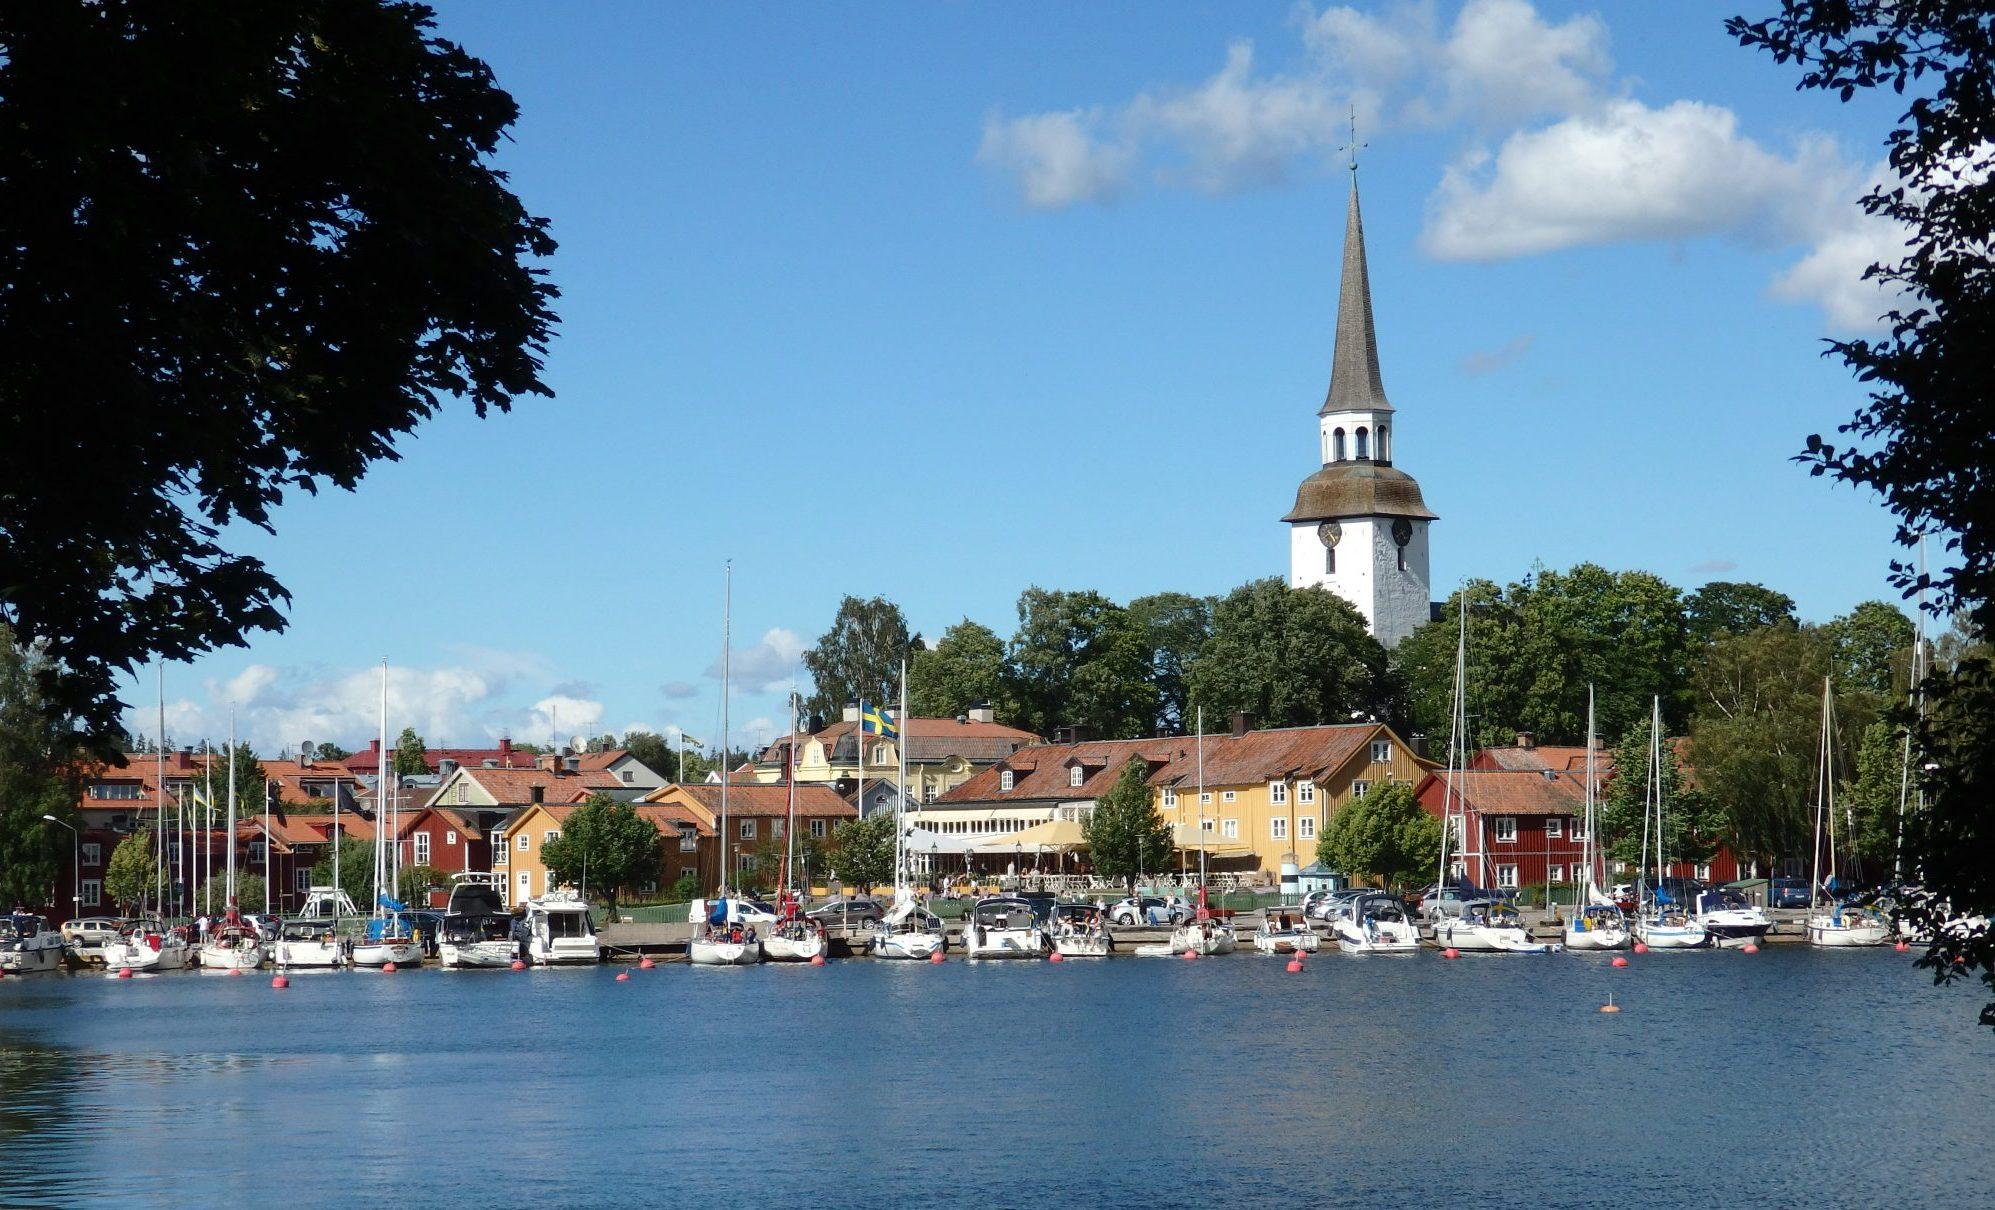 Mariefred, Sweden